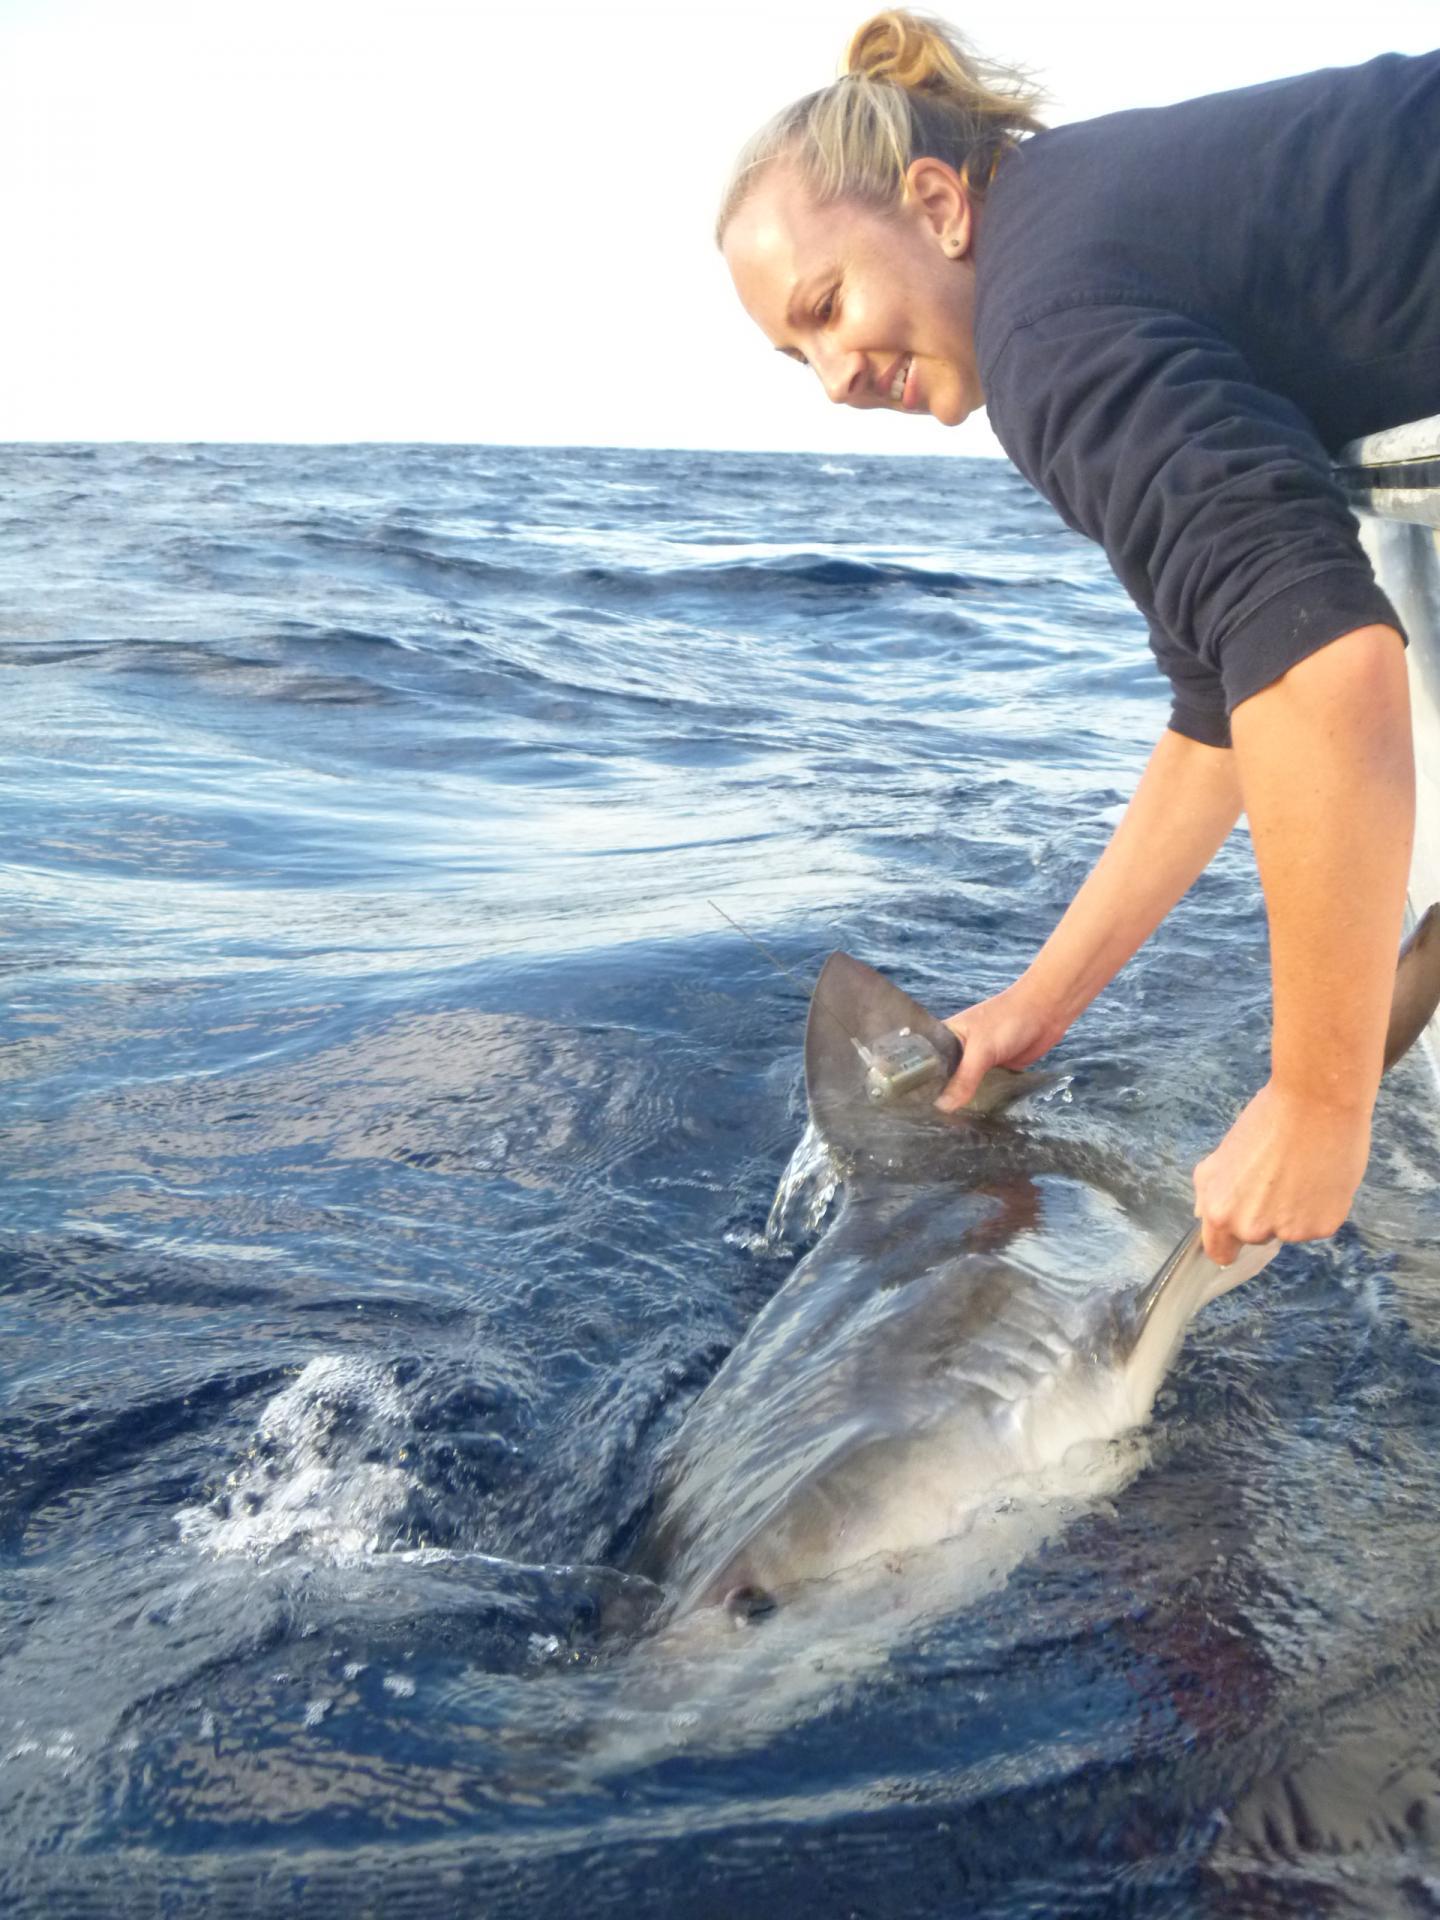 University Study Shows Longline Fishing Hampers Shark Migration